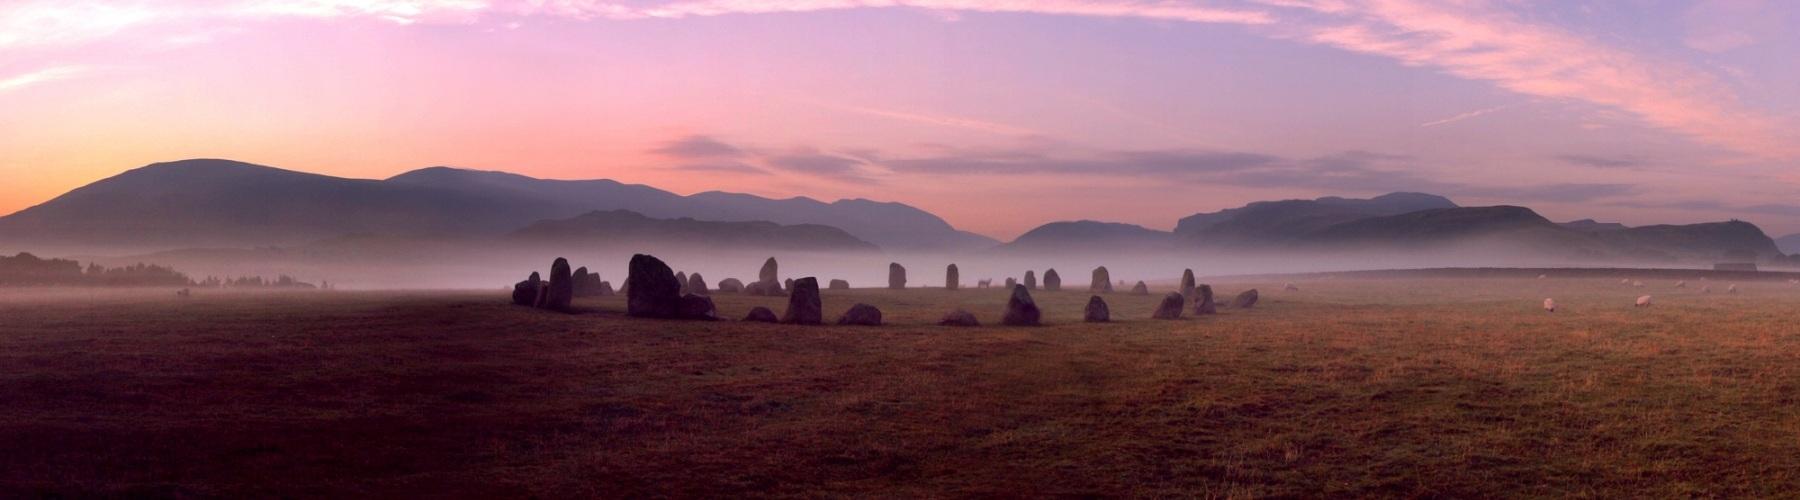 P0071-Autumn-Dawn-at-Castlerigg